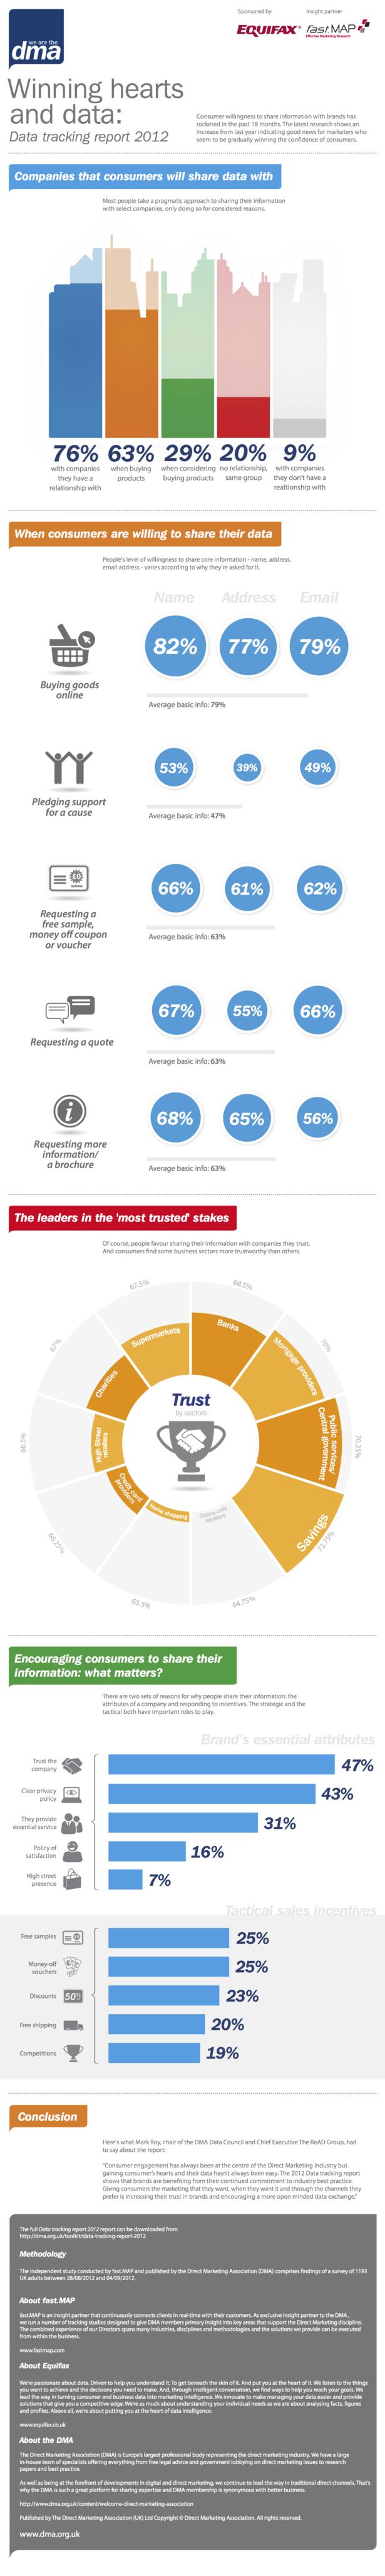 dma data tracking study 2012 infographic